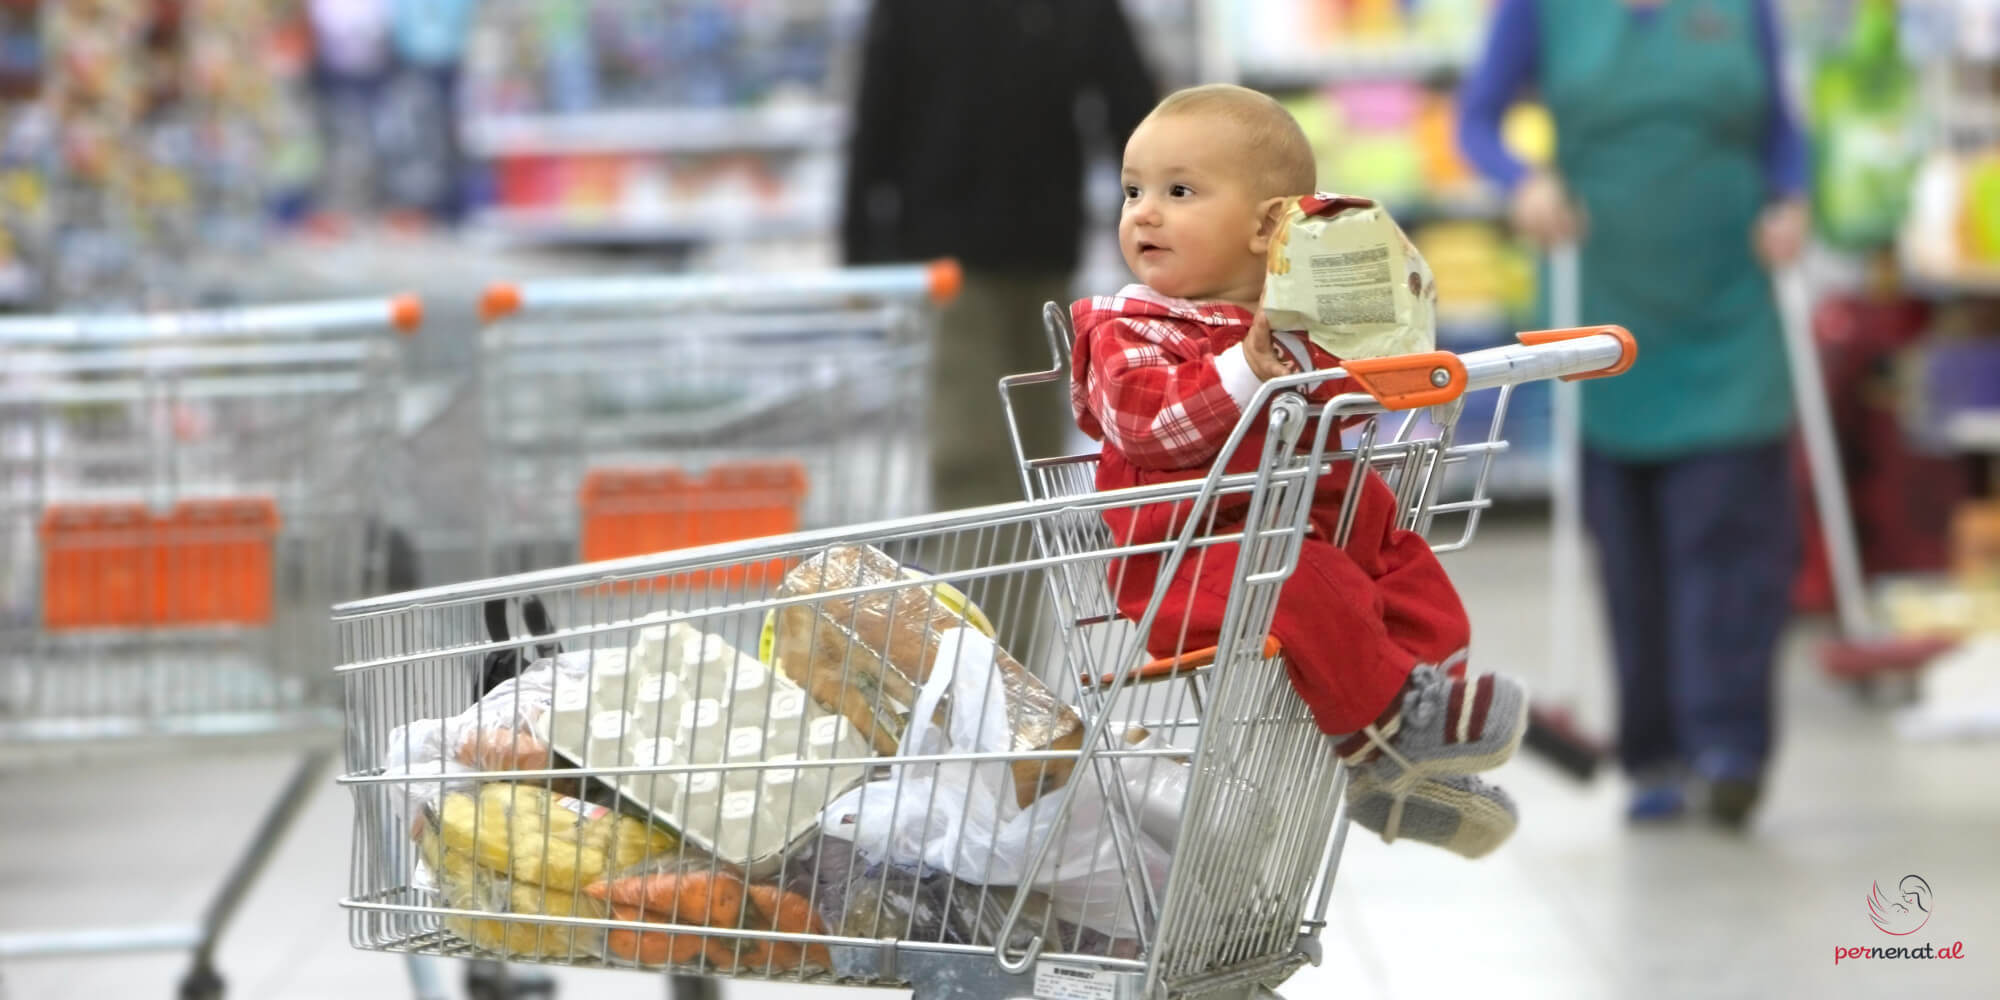 femija ne karrocen e supermarketit, siguria